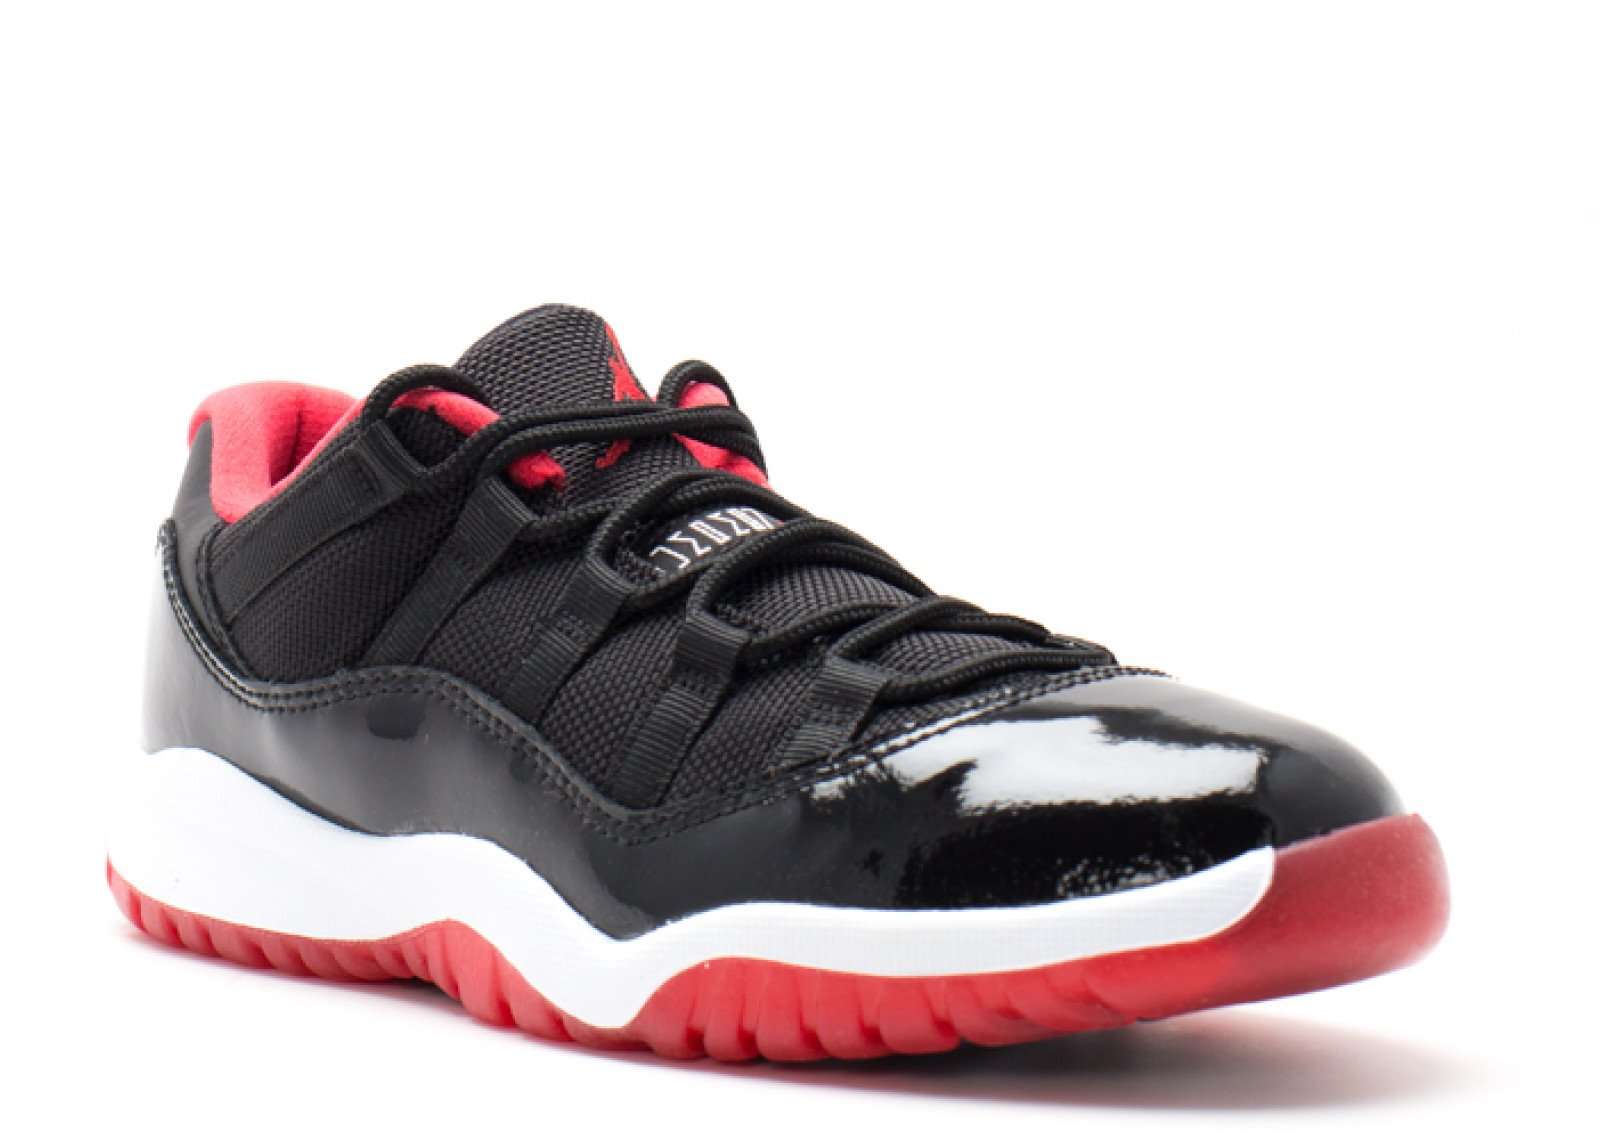 Jordan 11 Retro Low BP Black/Red/White 505835-012 (Size: 3Y)